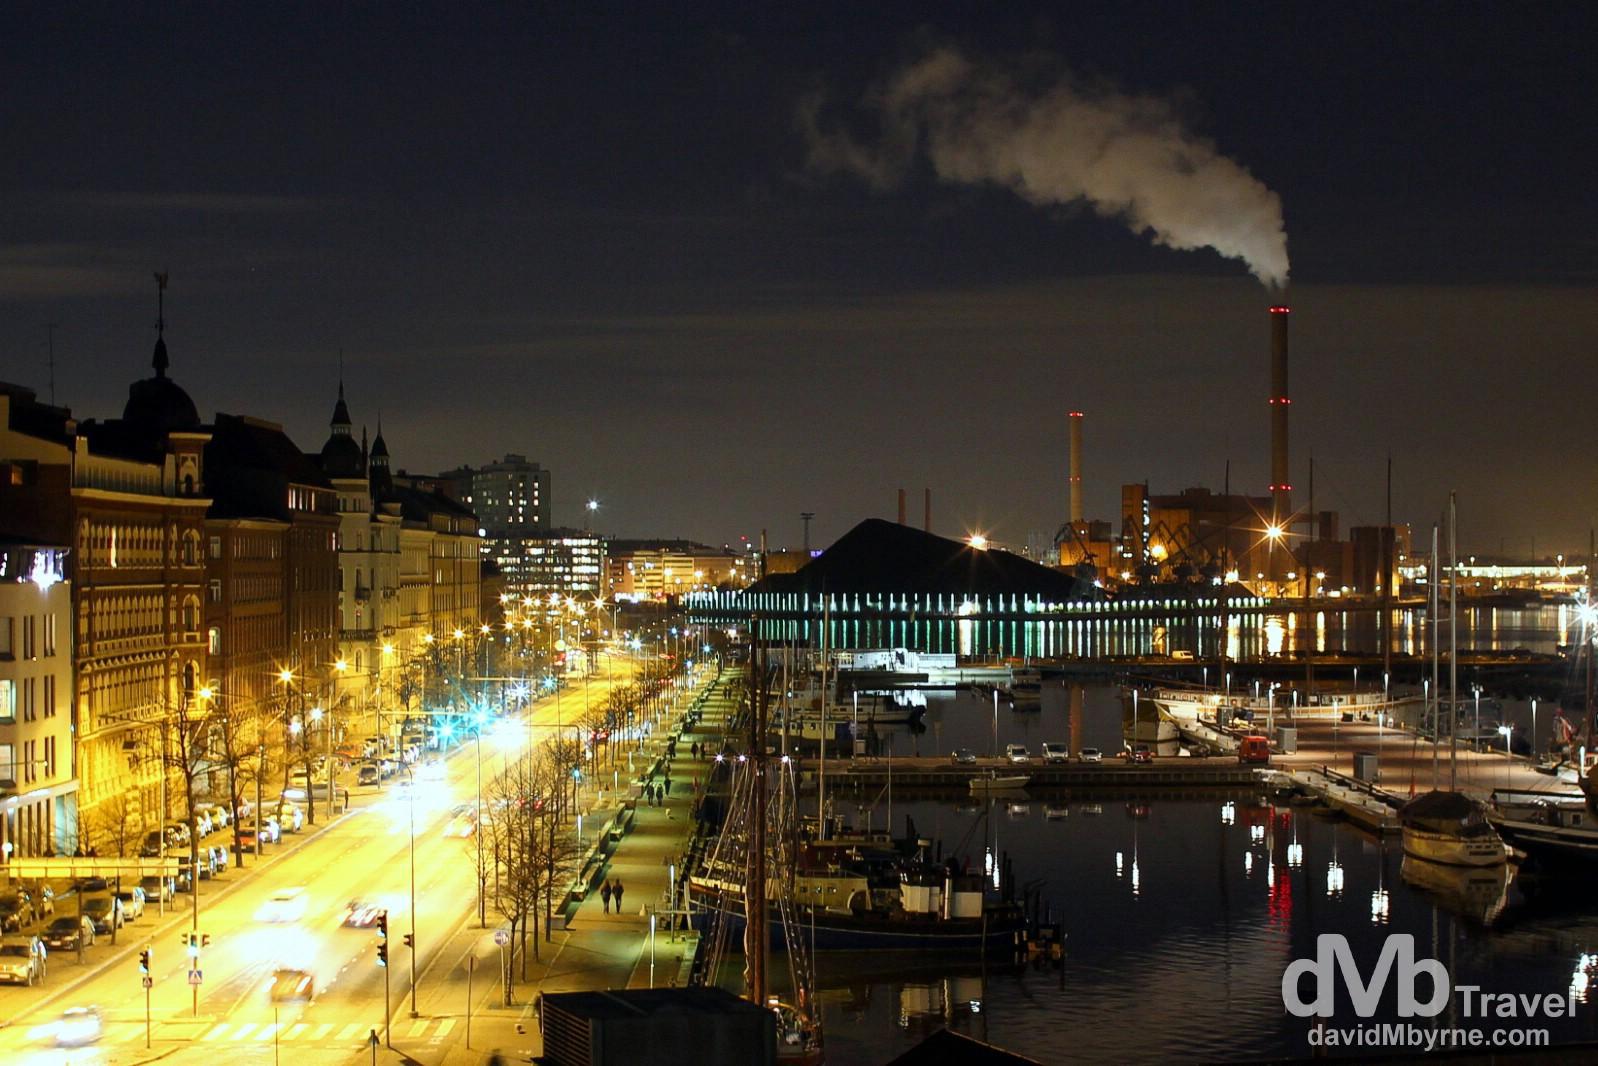 A night time view along Pohjoisranta (street) towards eastern Helsinki from the grounds of the Finnish Orthodox Uspenski Cathedral. Helsinki, Finland. November 24th 2012.